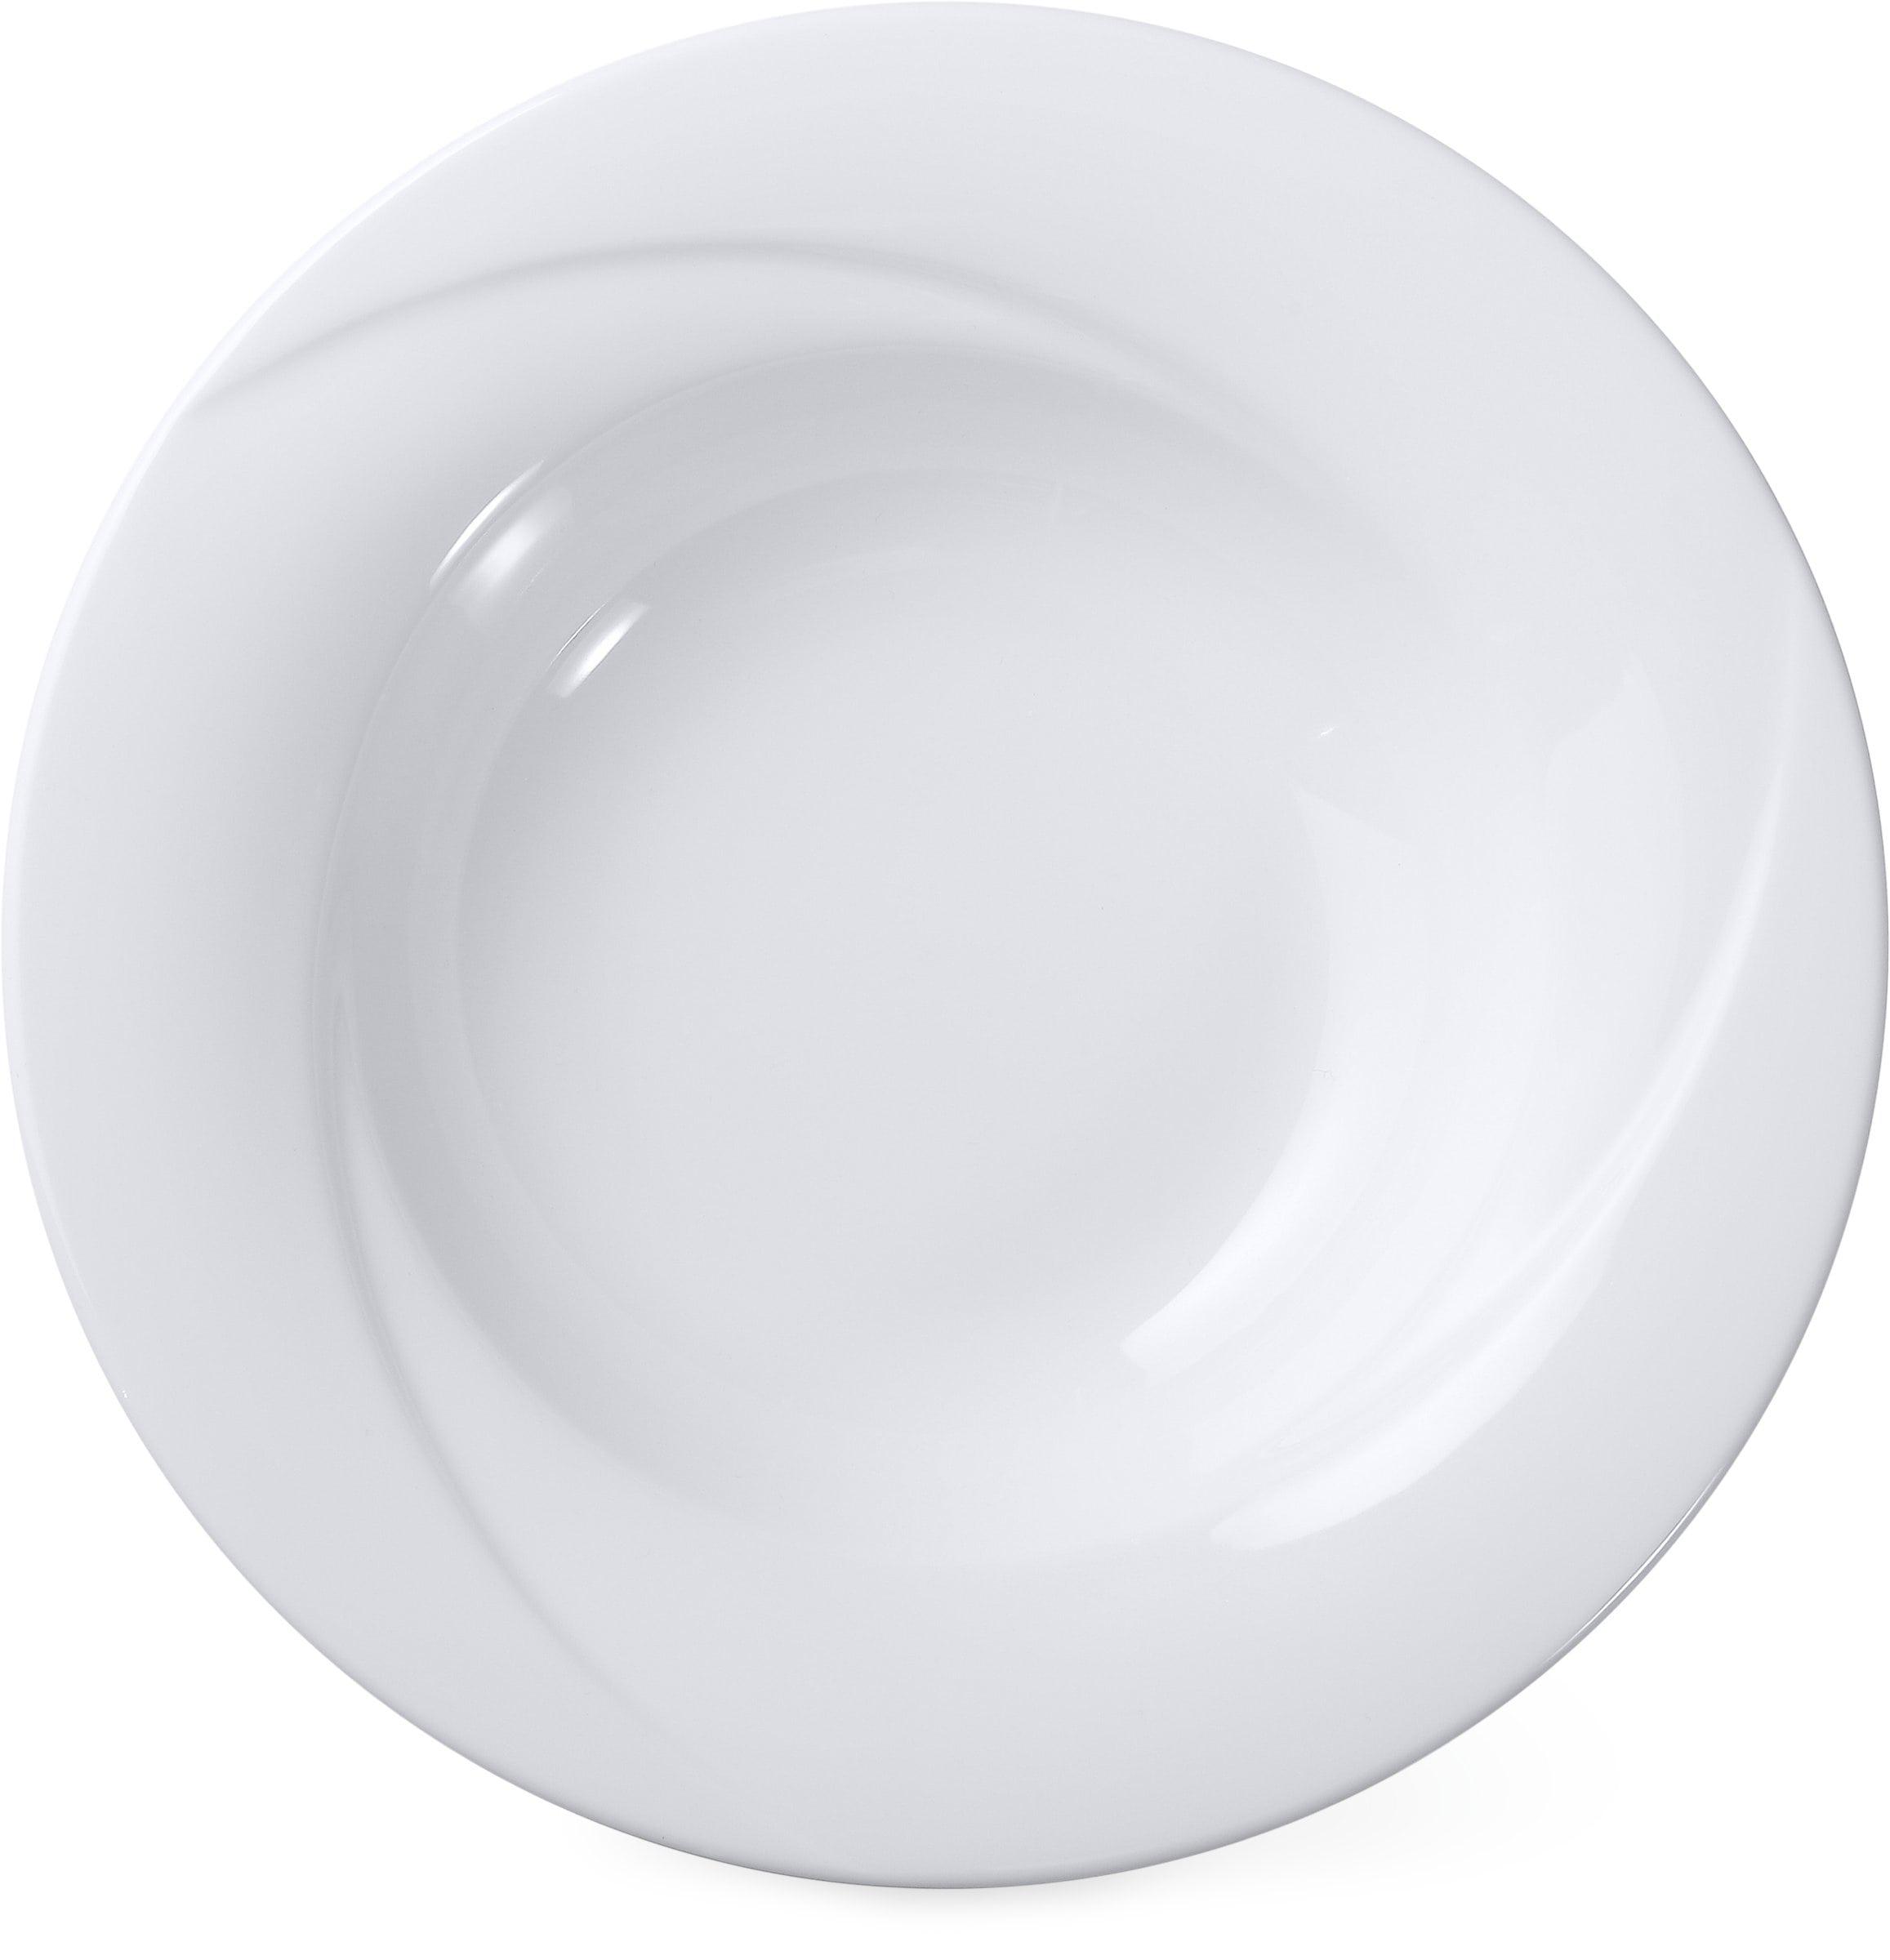 Cucina & Tavola NIKITA Piatto fondo